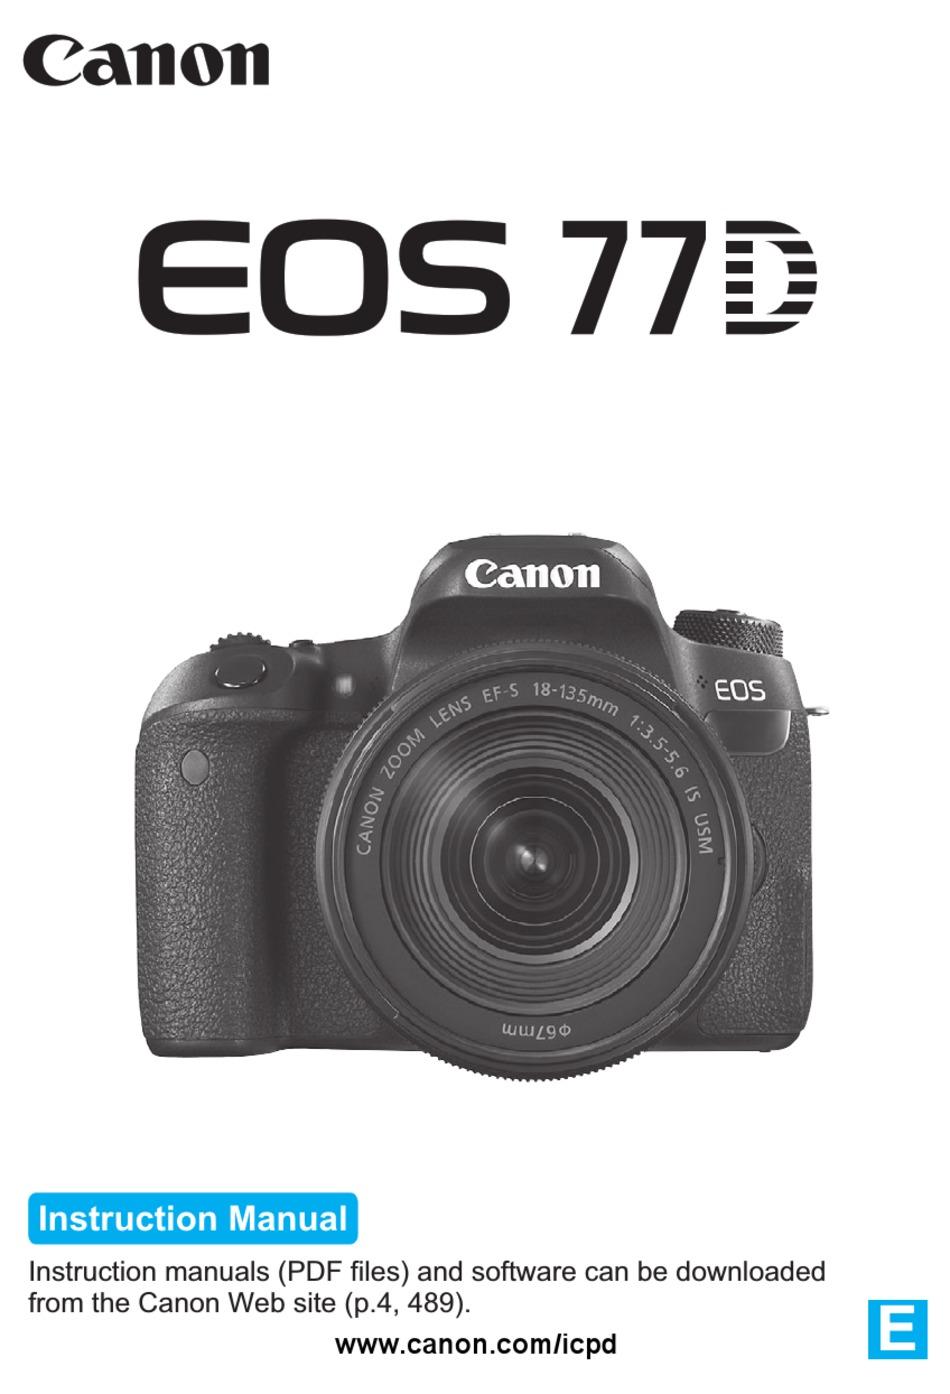 CANON EOS 20D INSTRUCTION MANUAL Pdf Download   ManualsLib